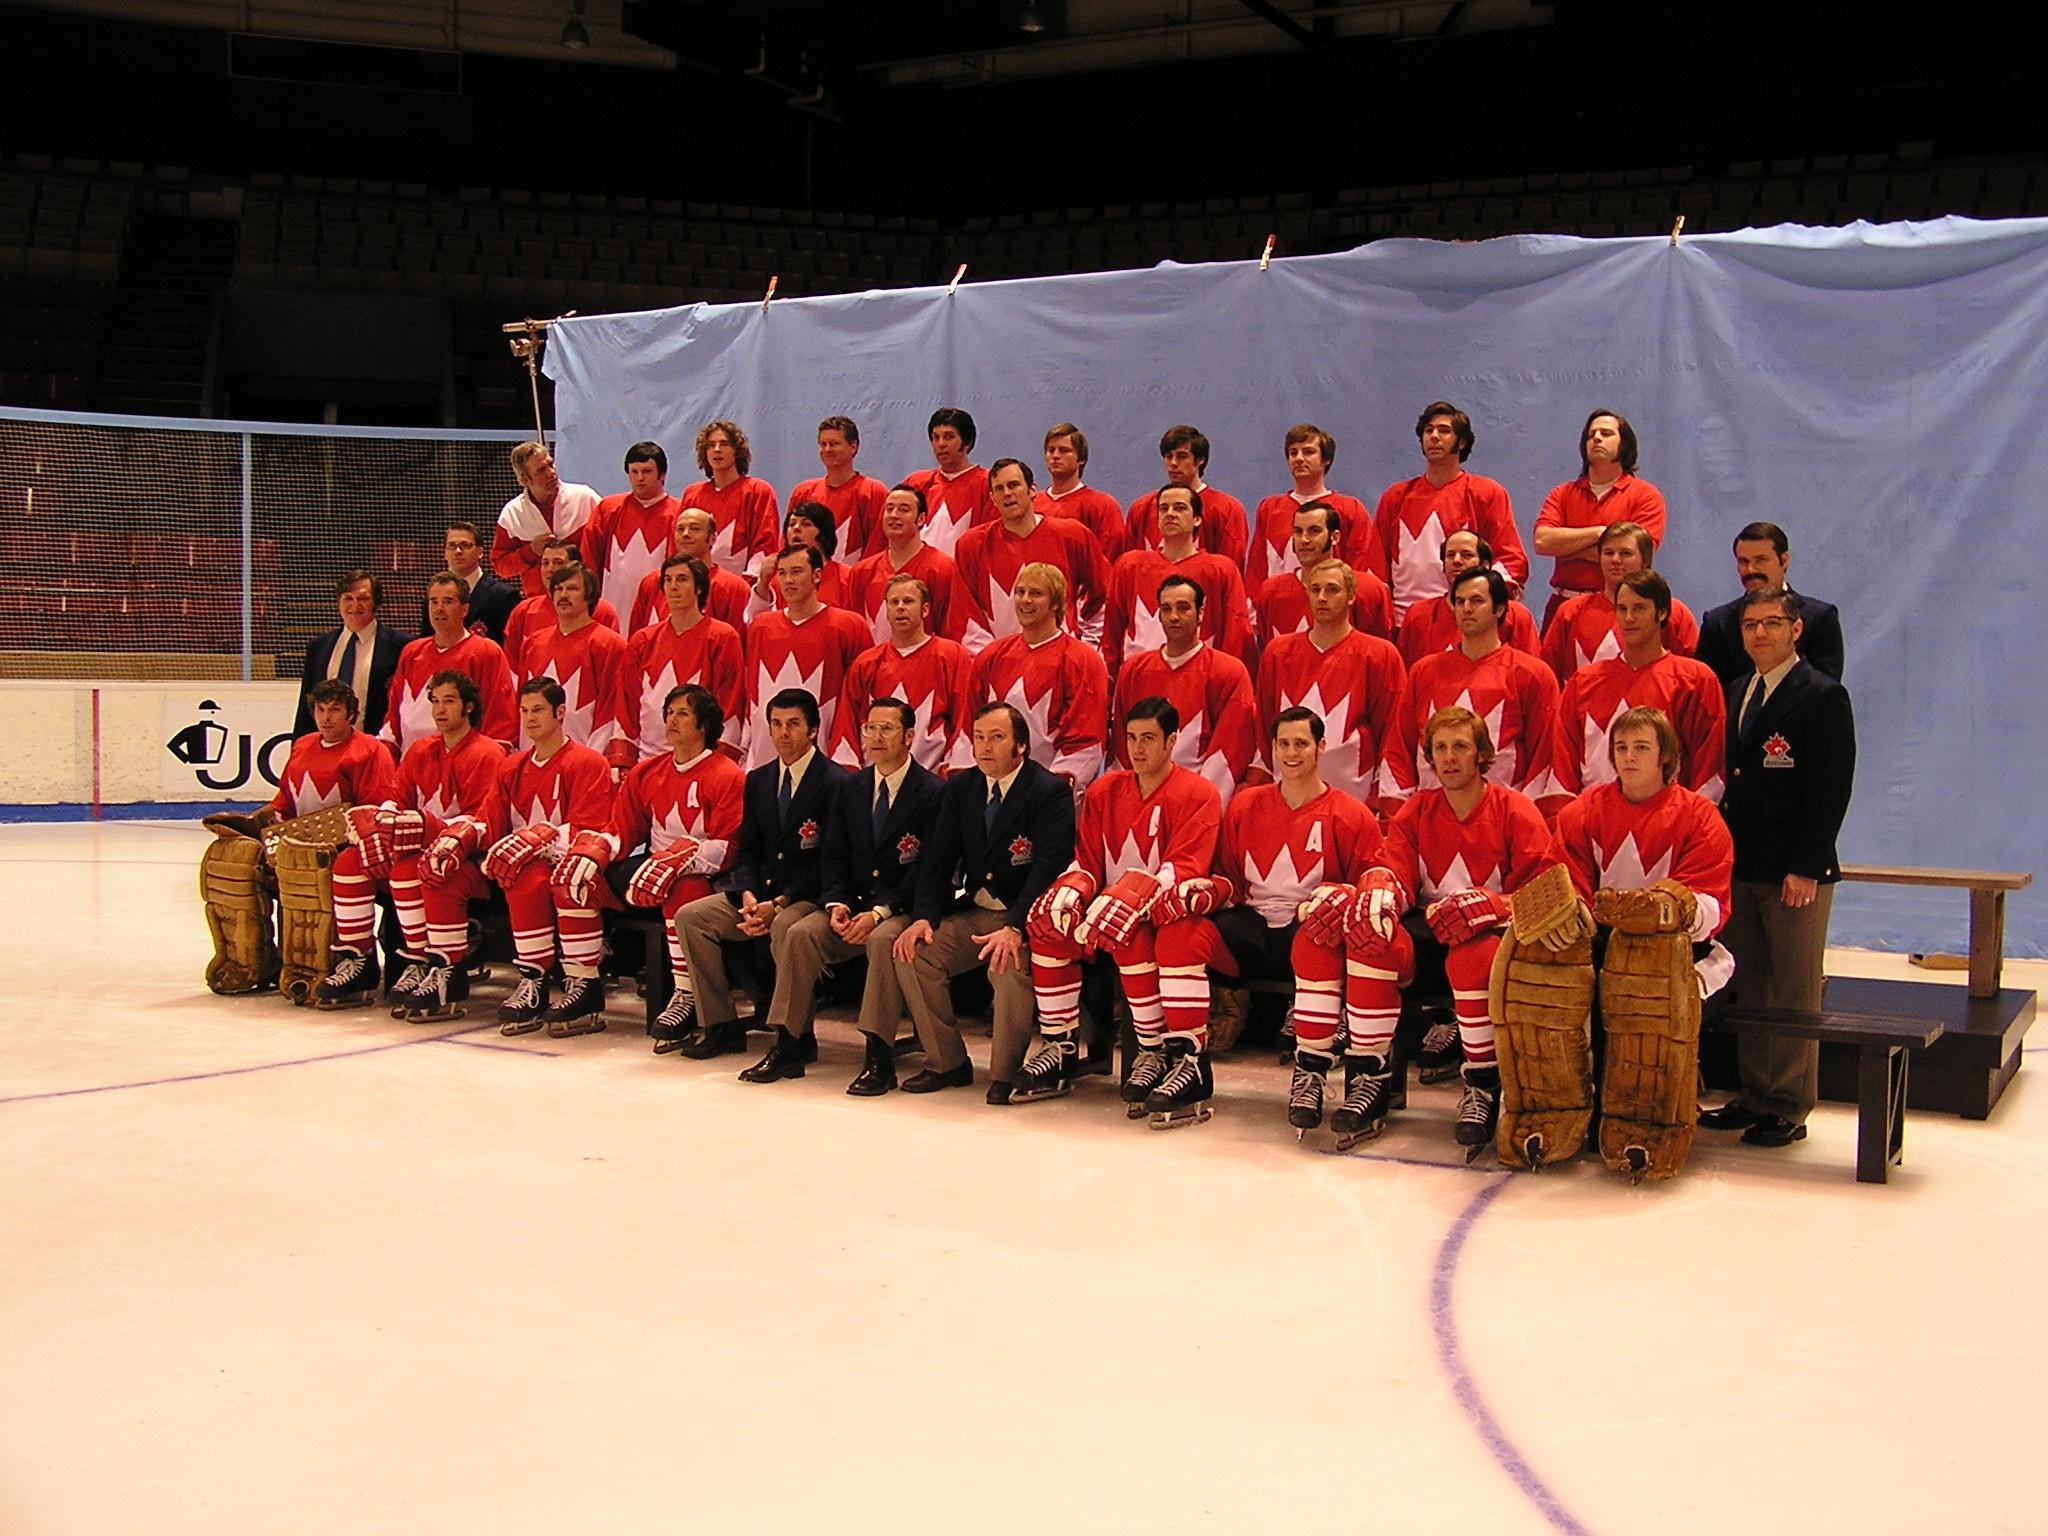 Dream Street Pictures - Canada Russia '72 - Team Canada